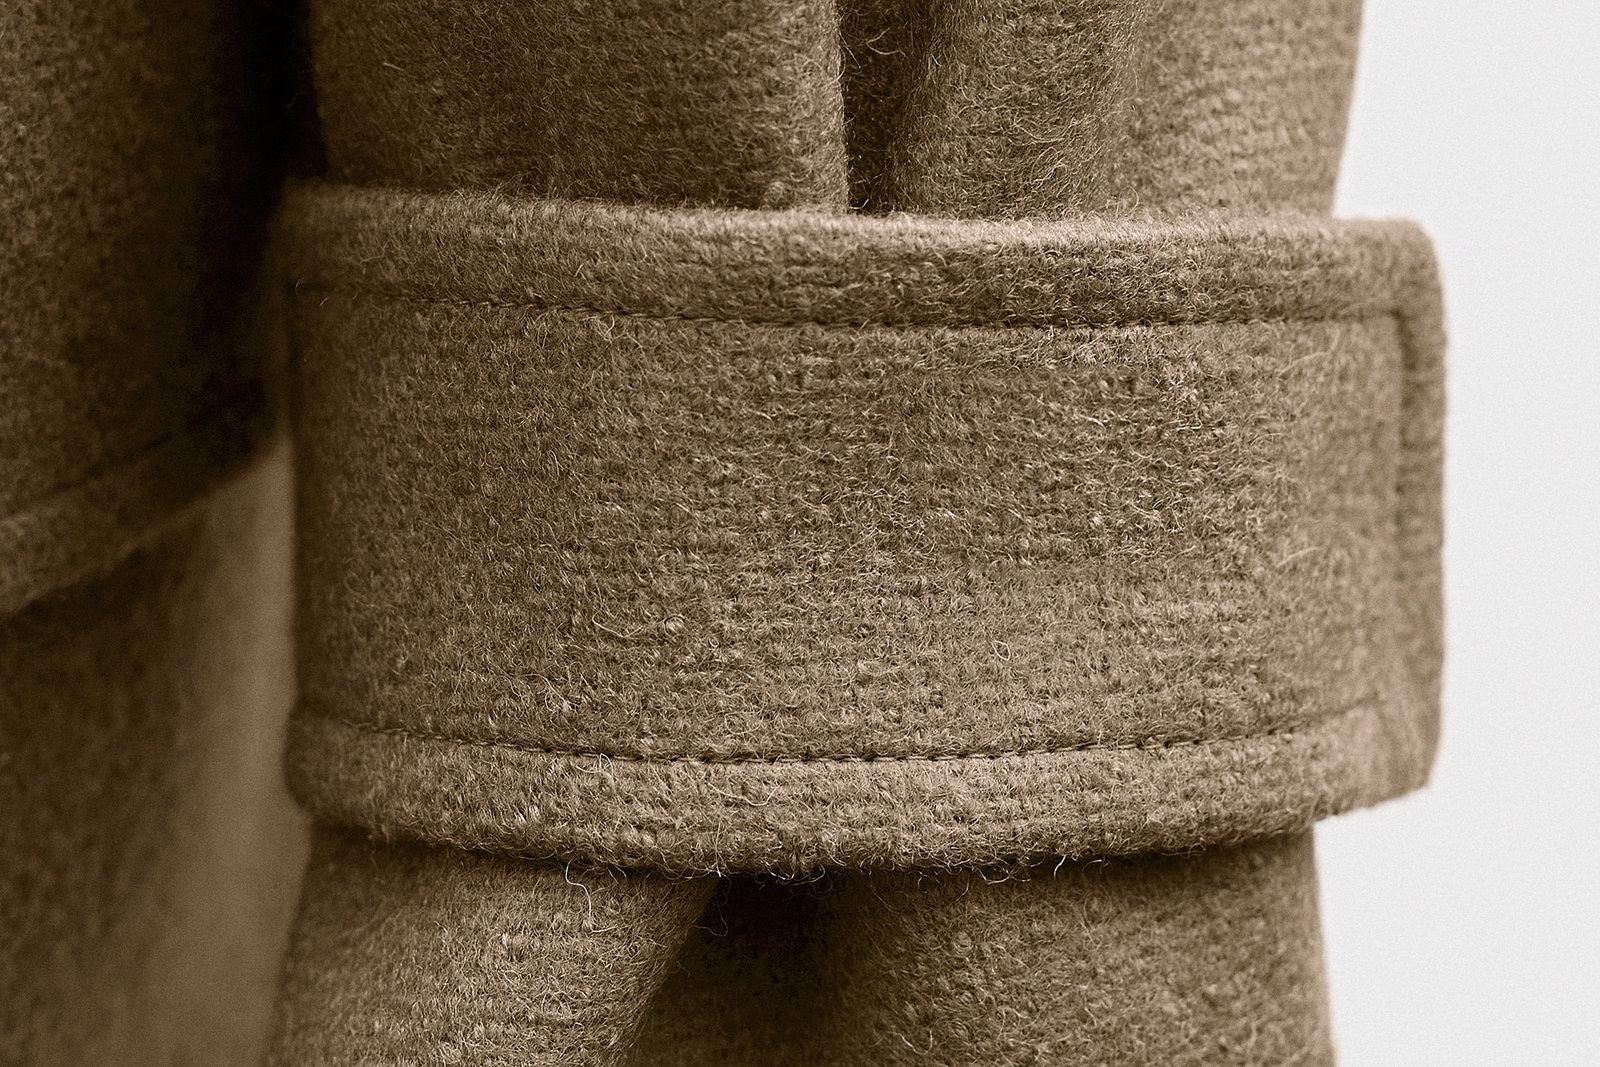 duffle-coat-wool-melton-camel-17@2x.jpg